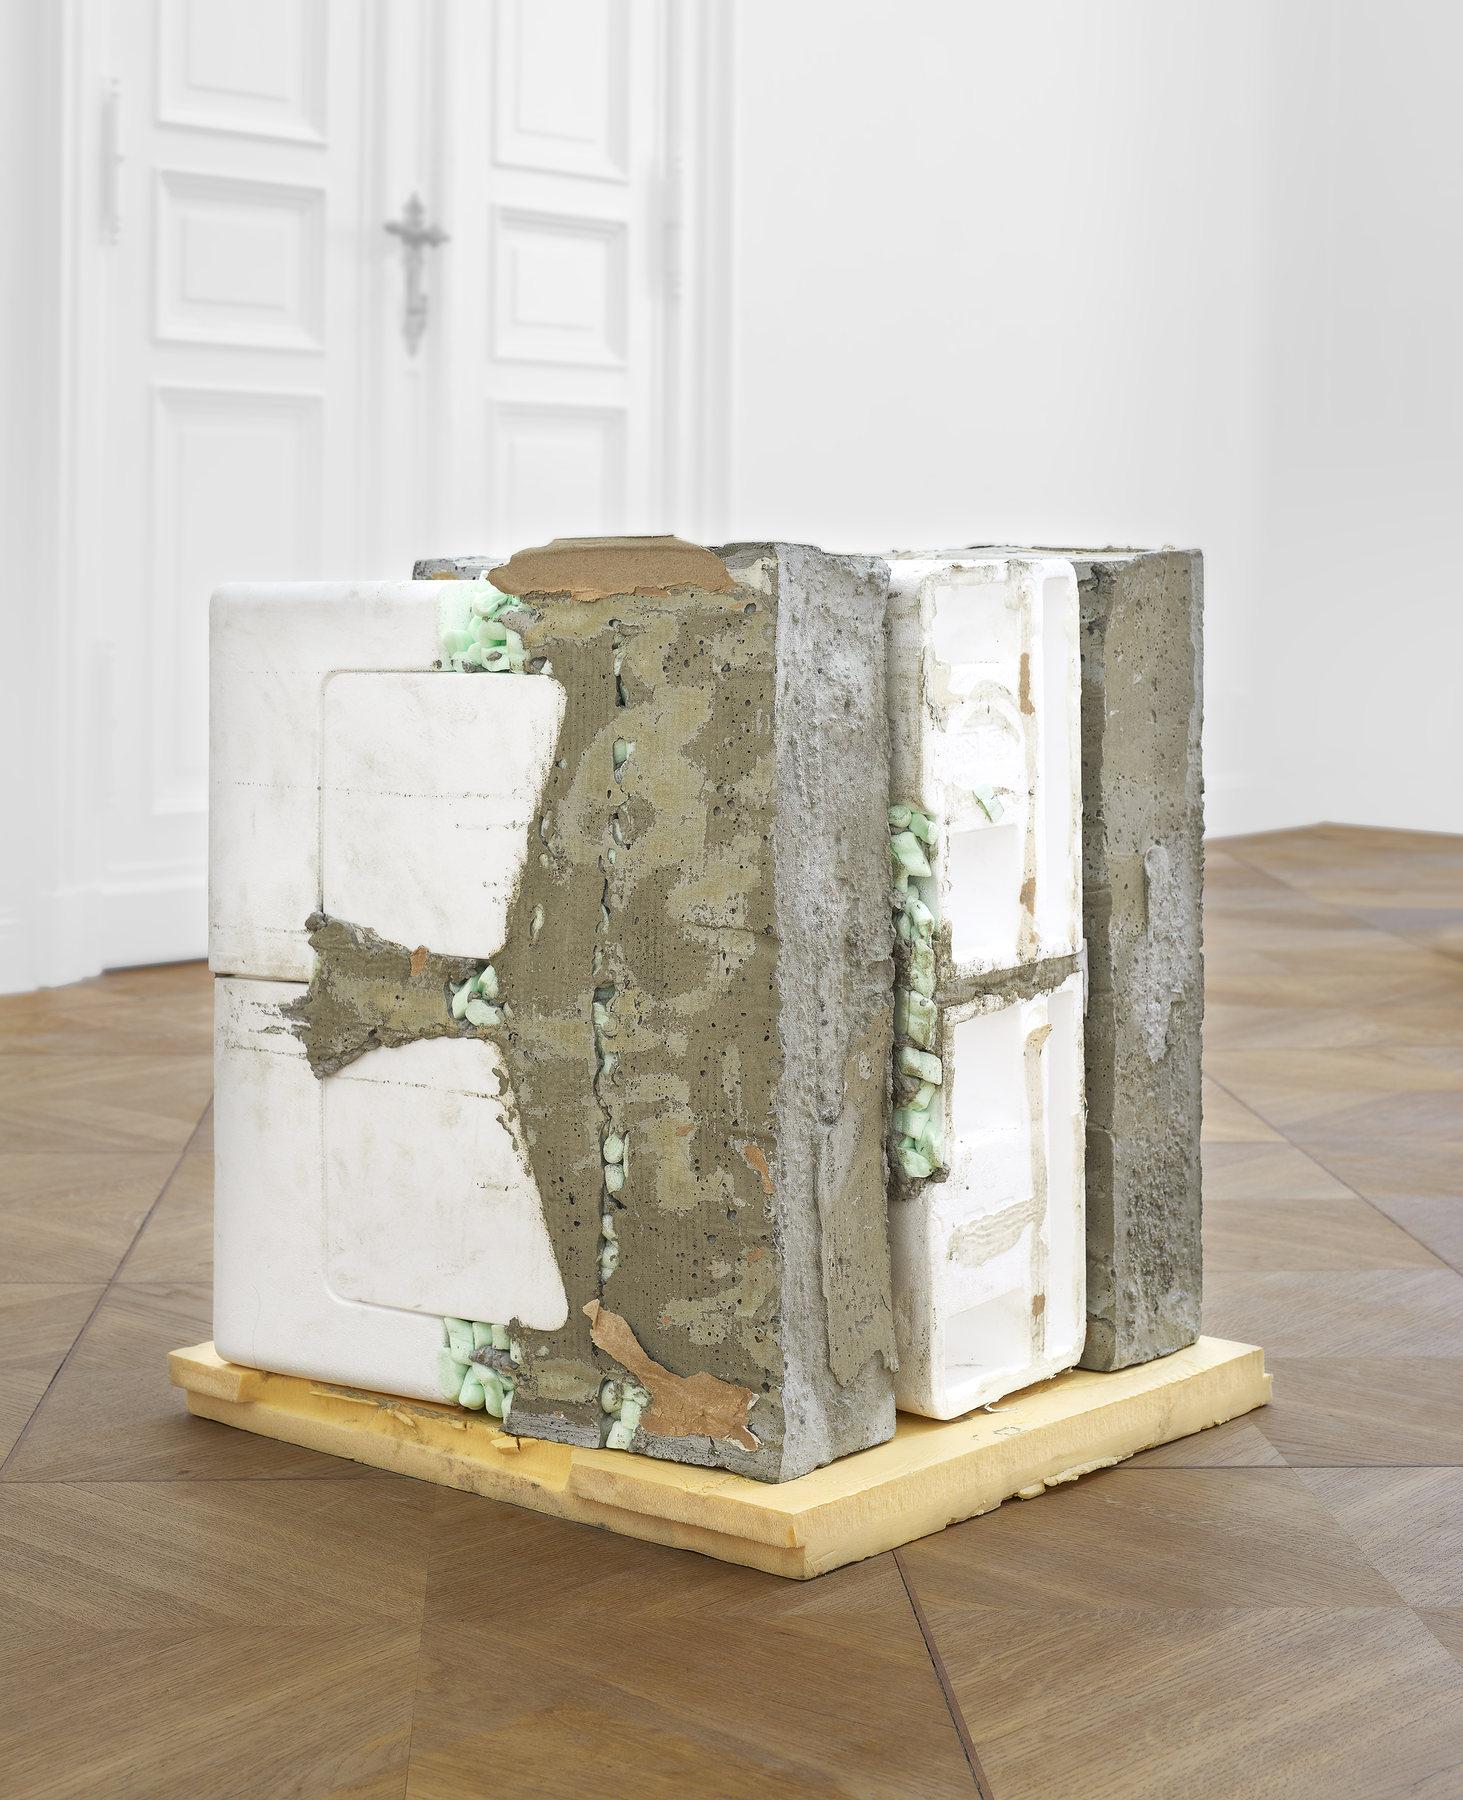 David Hanes at Open Forum – Art Viewer